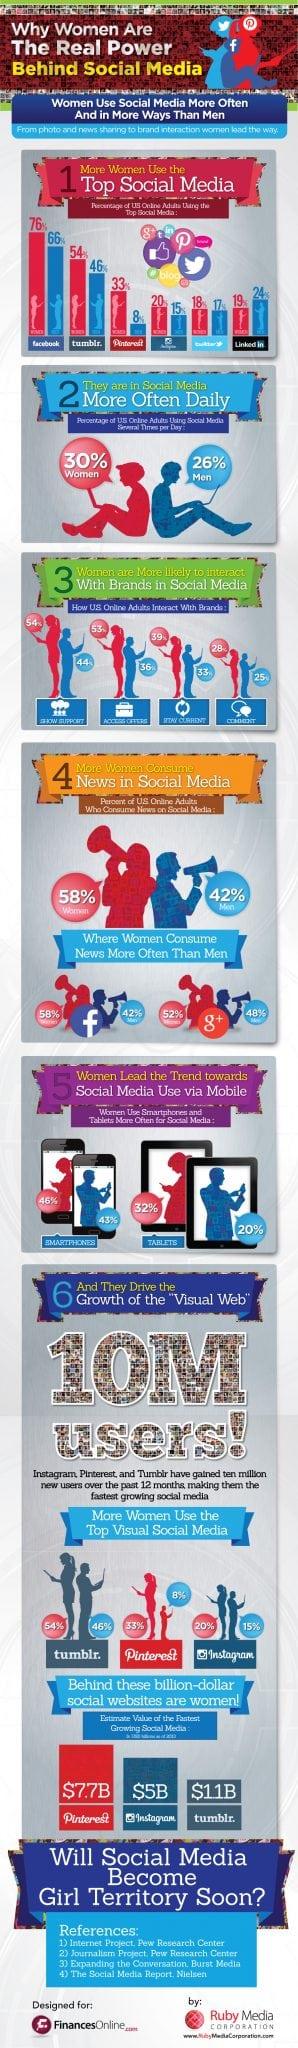 social-media-infographic